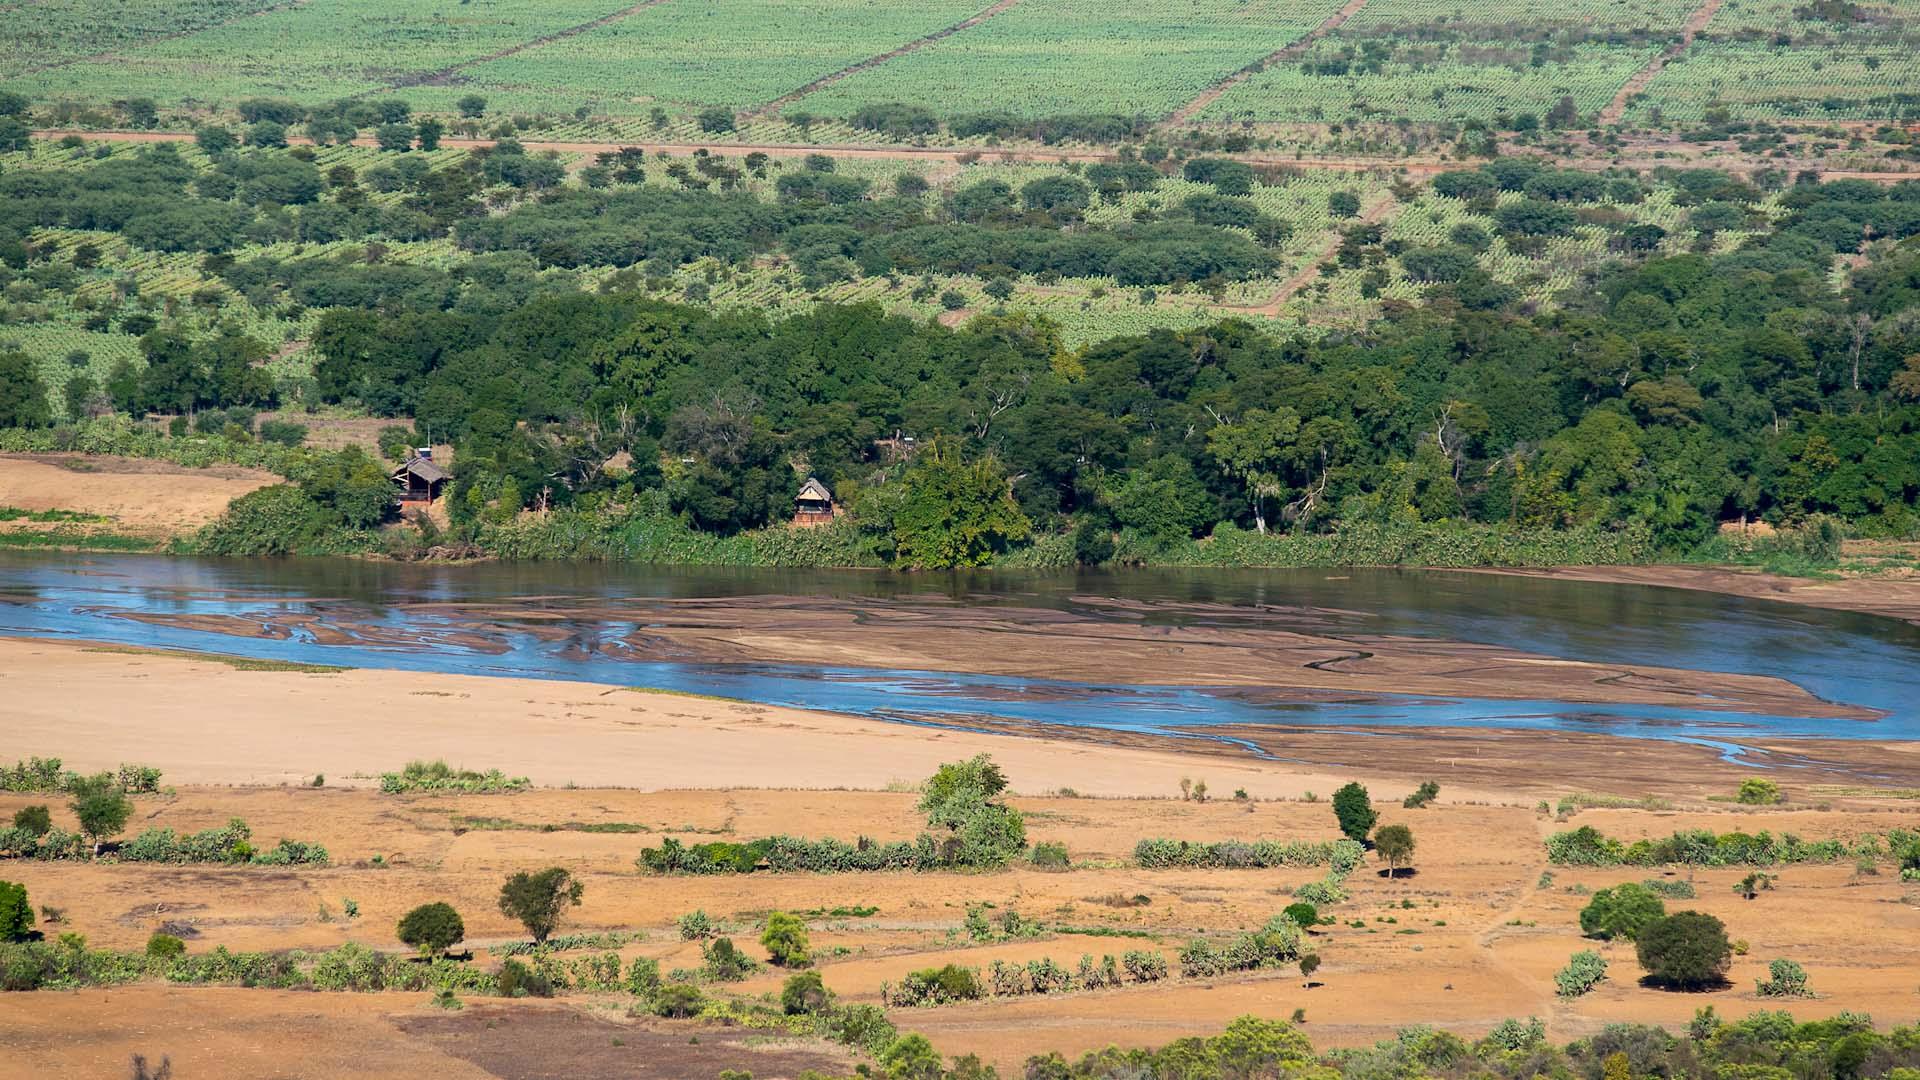 mandrare-river-camp-aerial